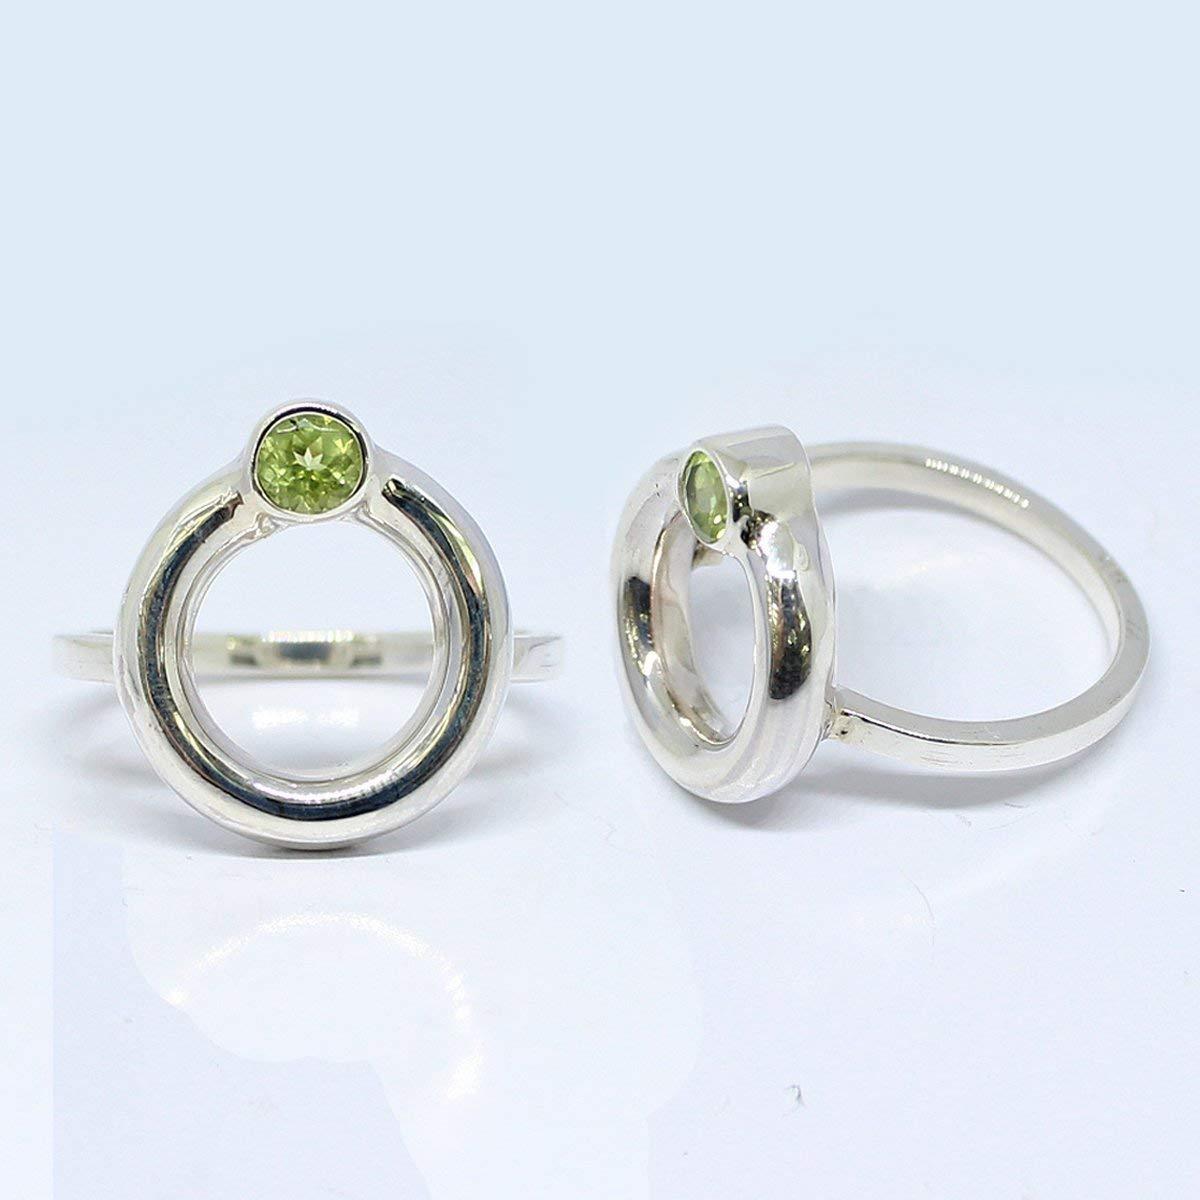 Handmade sterling silver ring with genuine 4 * 4 mm peridot stone, beautiful gems stone ring, stunning bali handmade rings, silver ring with natural peridot stone